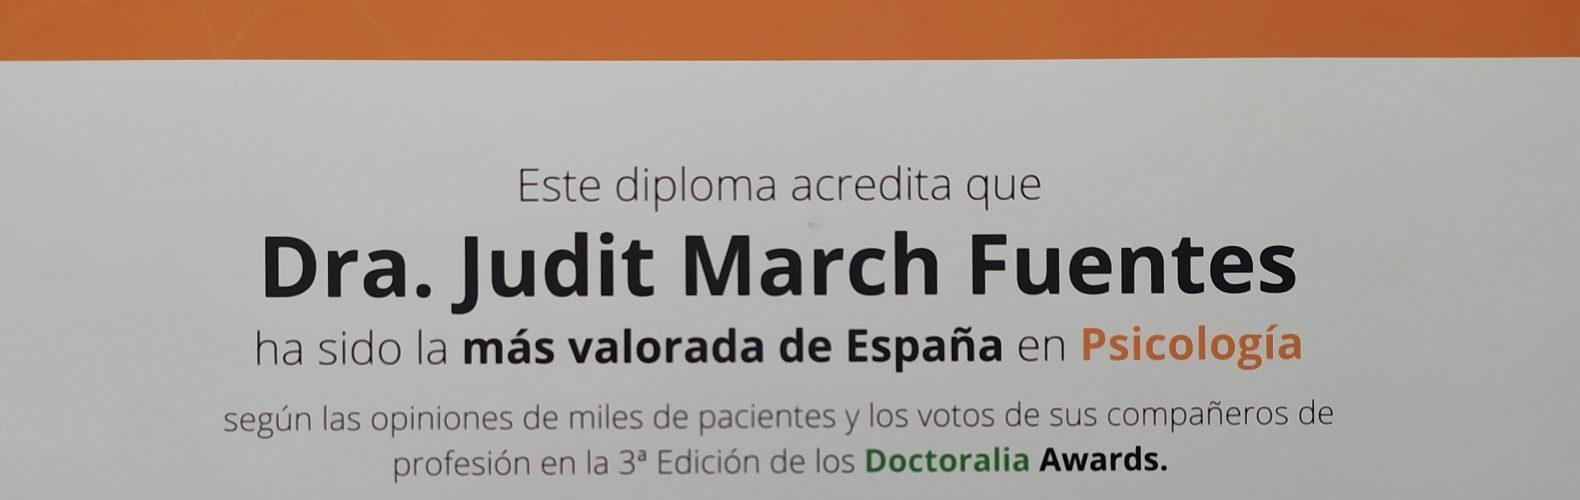 psicólogos, psicologos, psicólogos en barcelona, premio psicóloga, mejor psicóloga de Barcelona